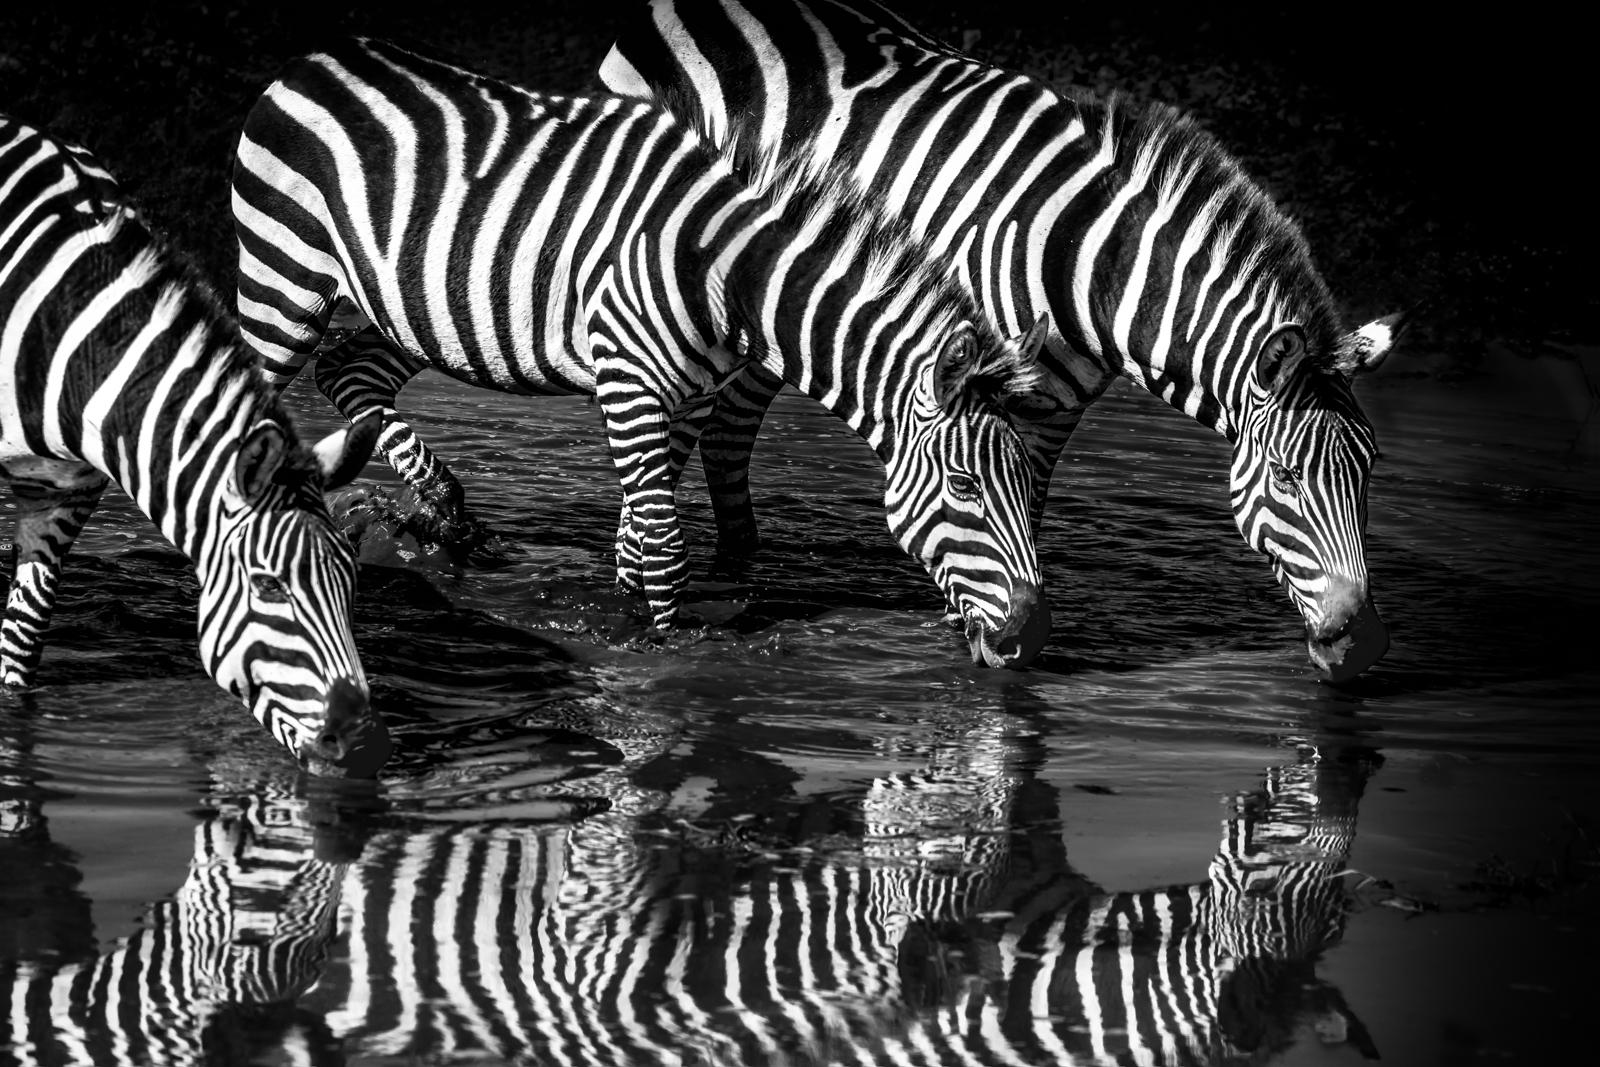 Julie_Eliason_Expressions_and_Impressions_Zebra_Reflection_05.jpg